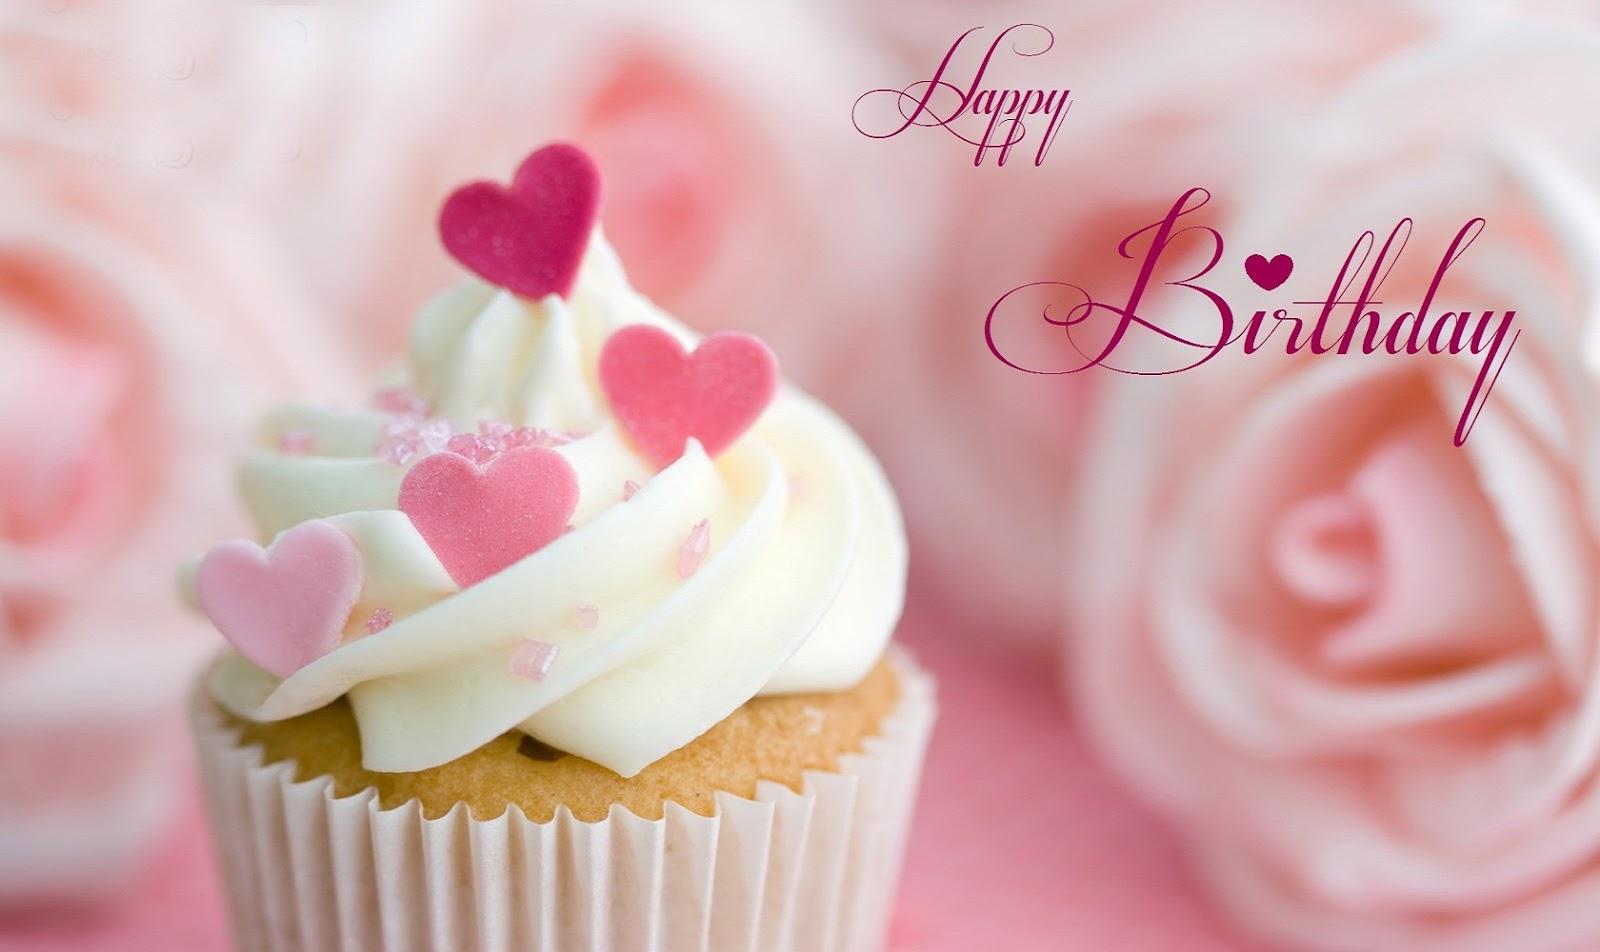 Happy Birthday To You Romantic Birthday Wish For Her Love